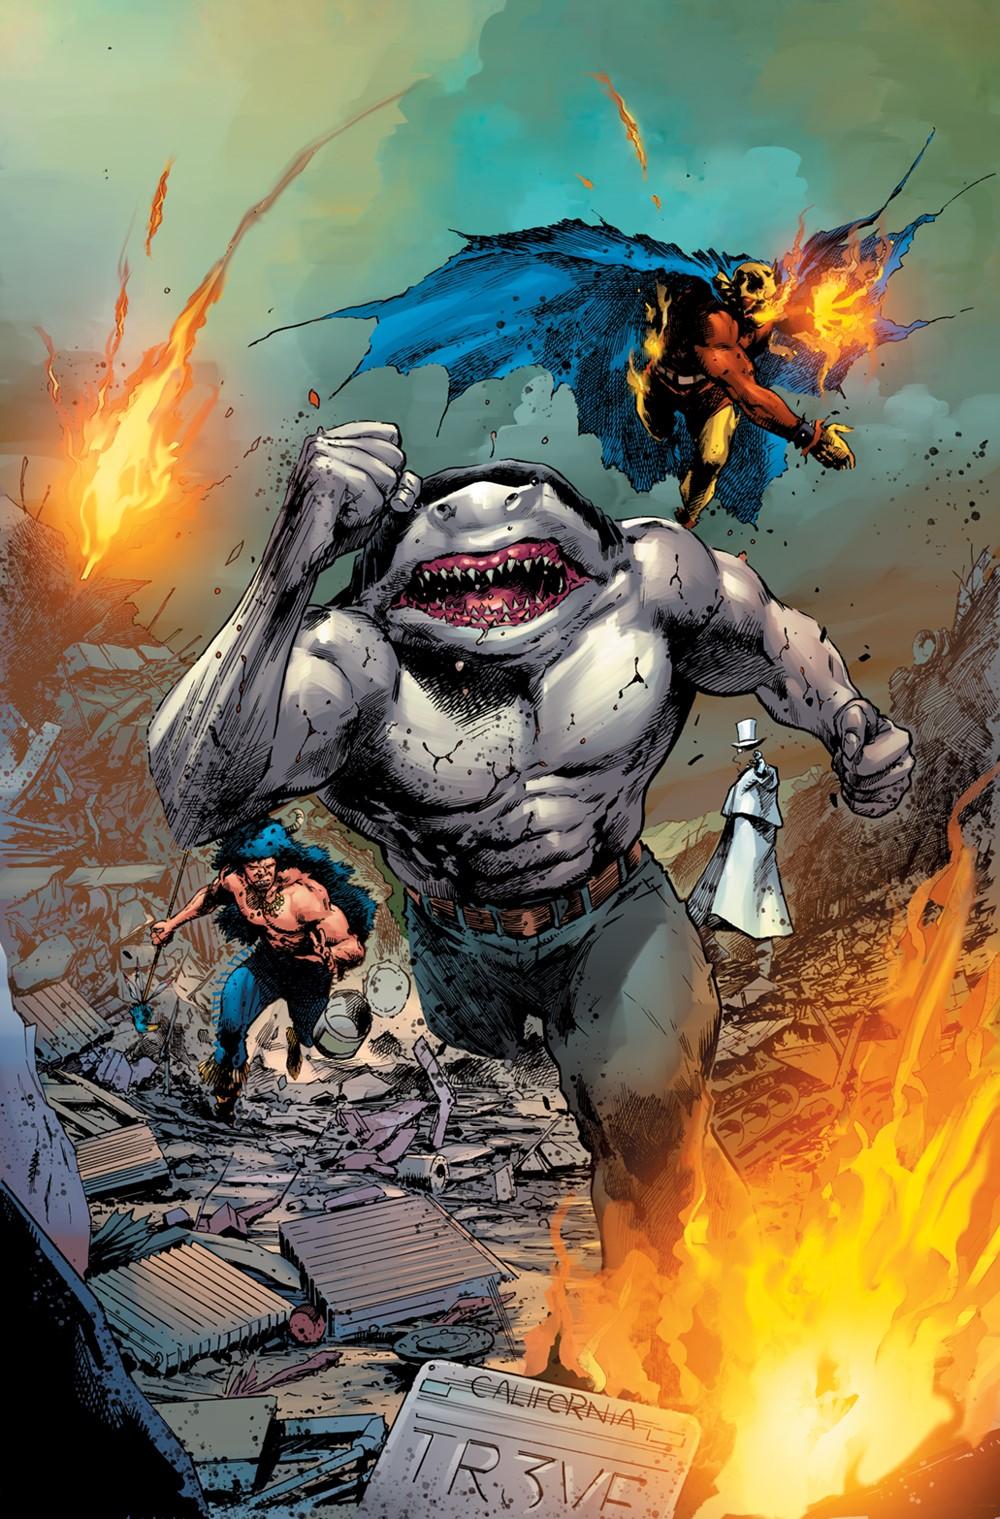 King_Shark_4_cover_COL DC Comics December 2021 Solicitations